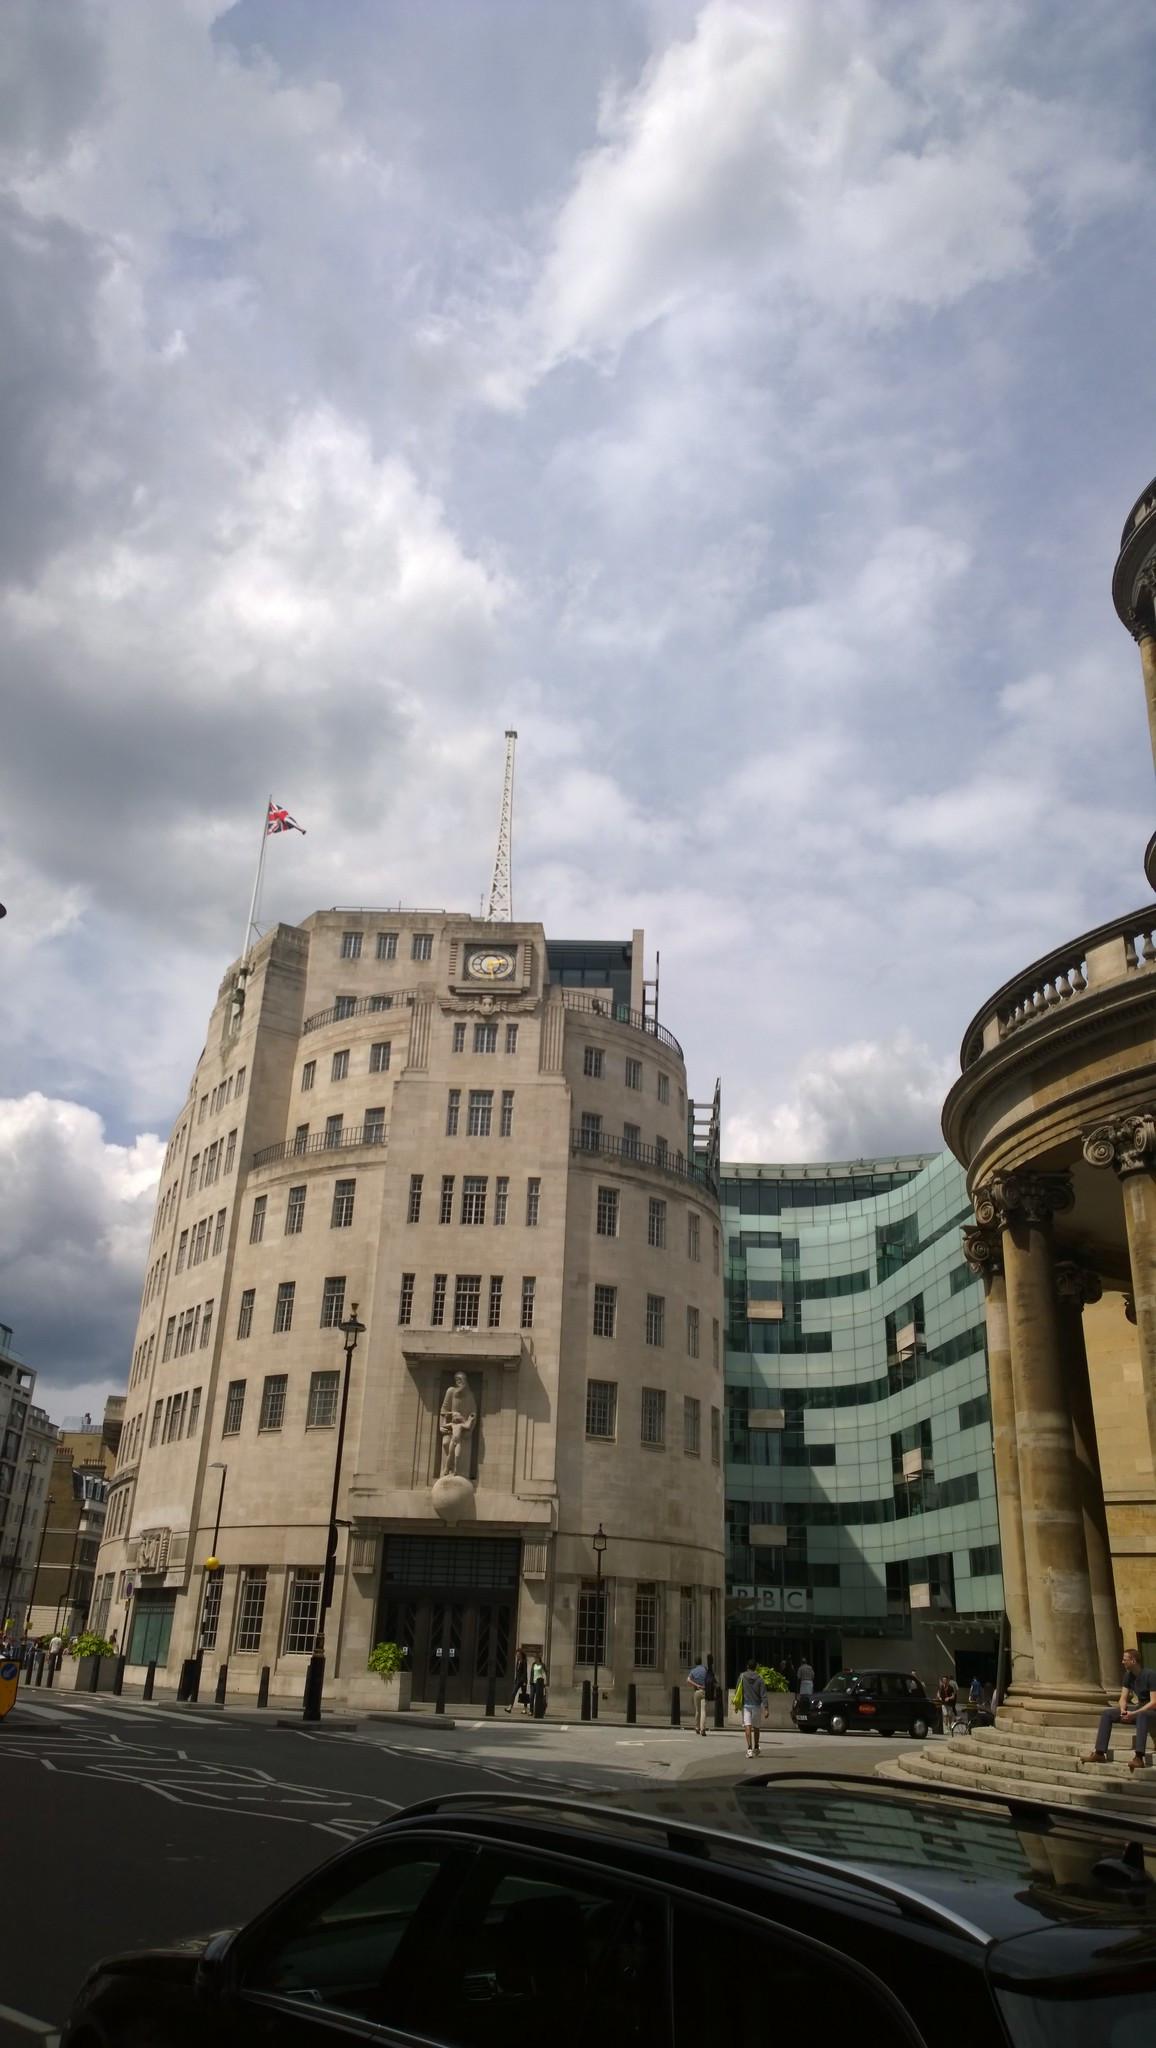 GB0BBC British Broadcasting Corporation, London, England